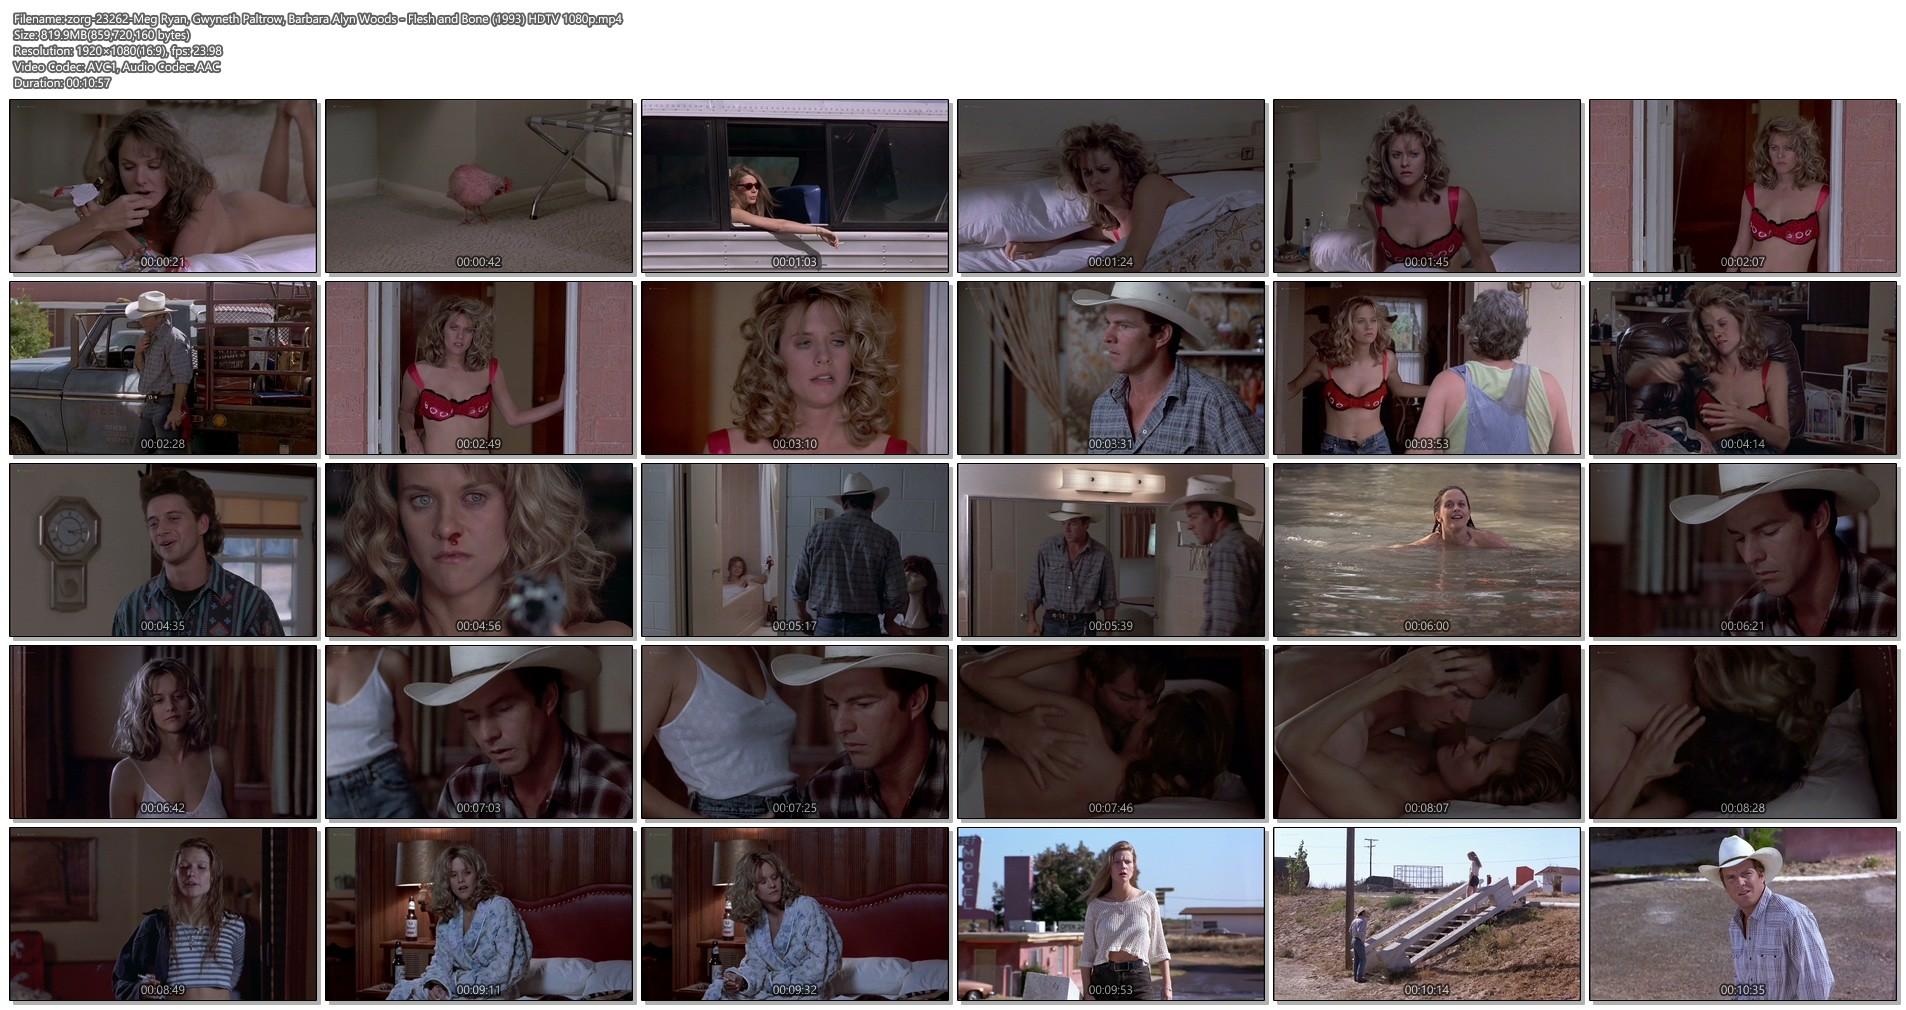 Gwyneth Paltrow nude Meg Ryan and Barbara Alyn Woods nude too - Flesh and Bone (1993) HDTV 1080p (1)